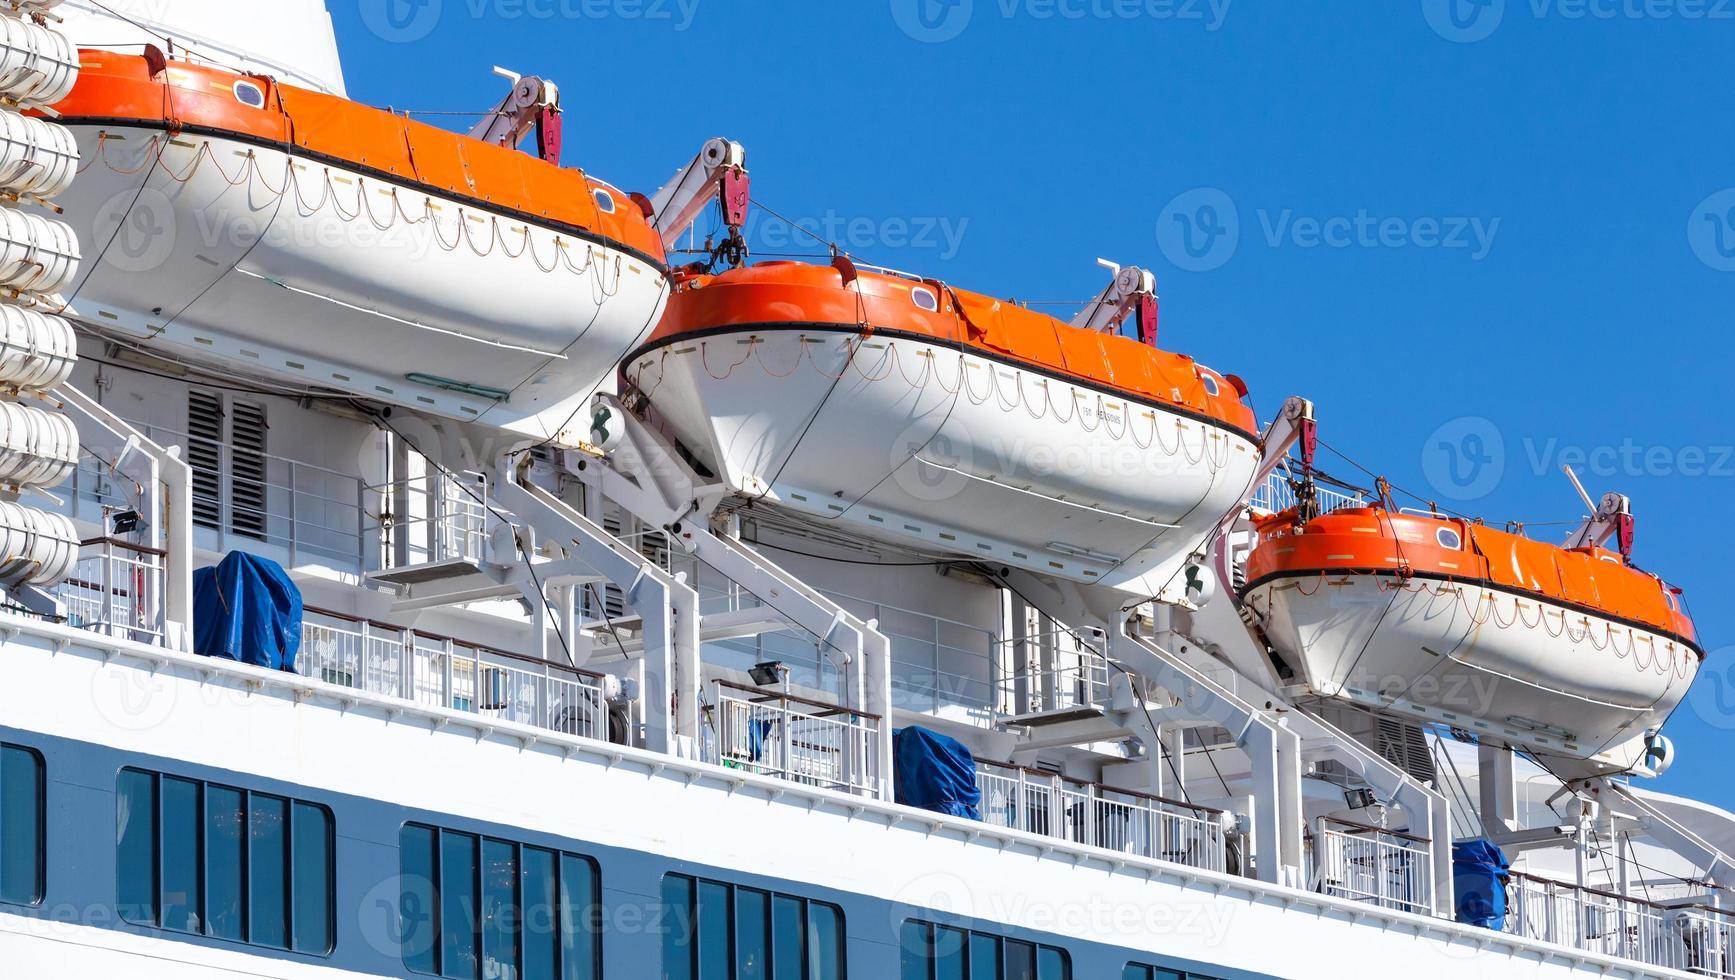 Rescue boats on big passenger ship photo